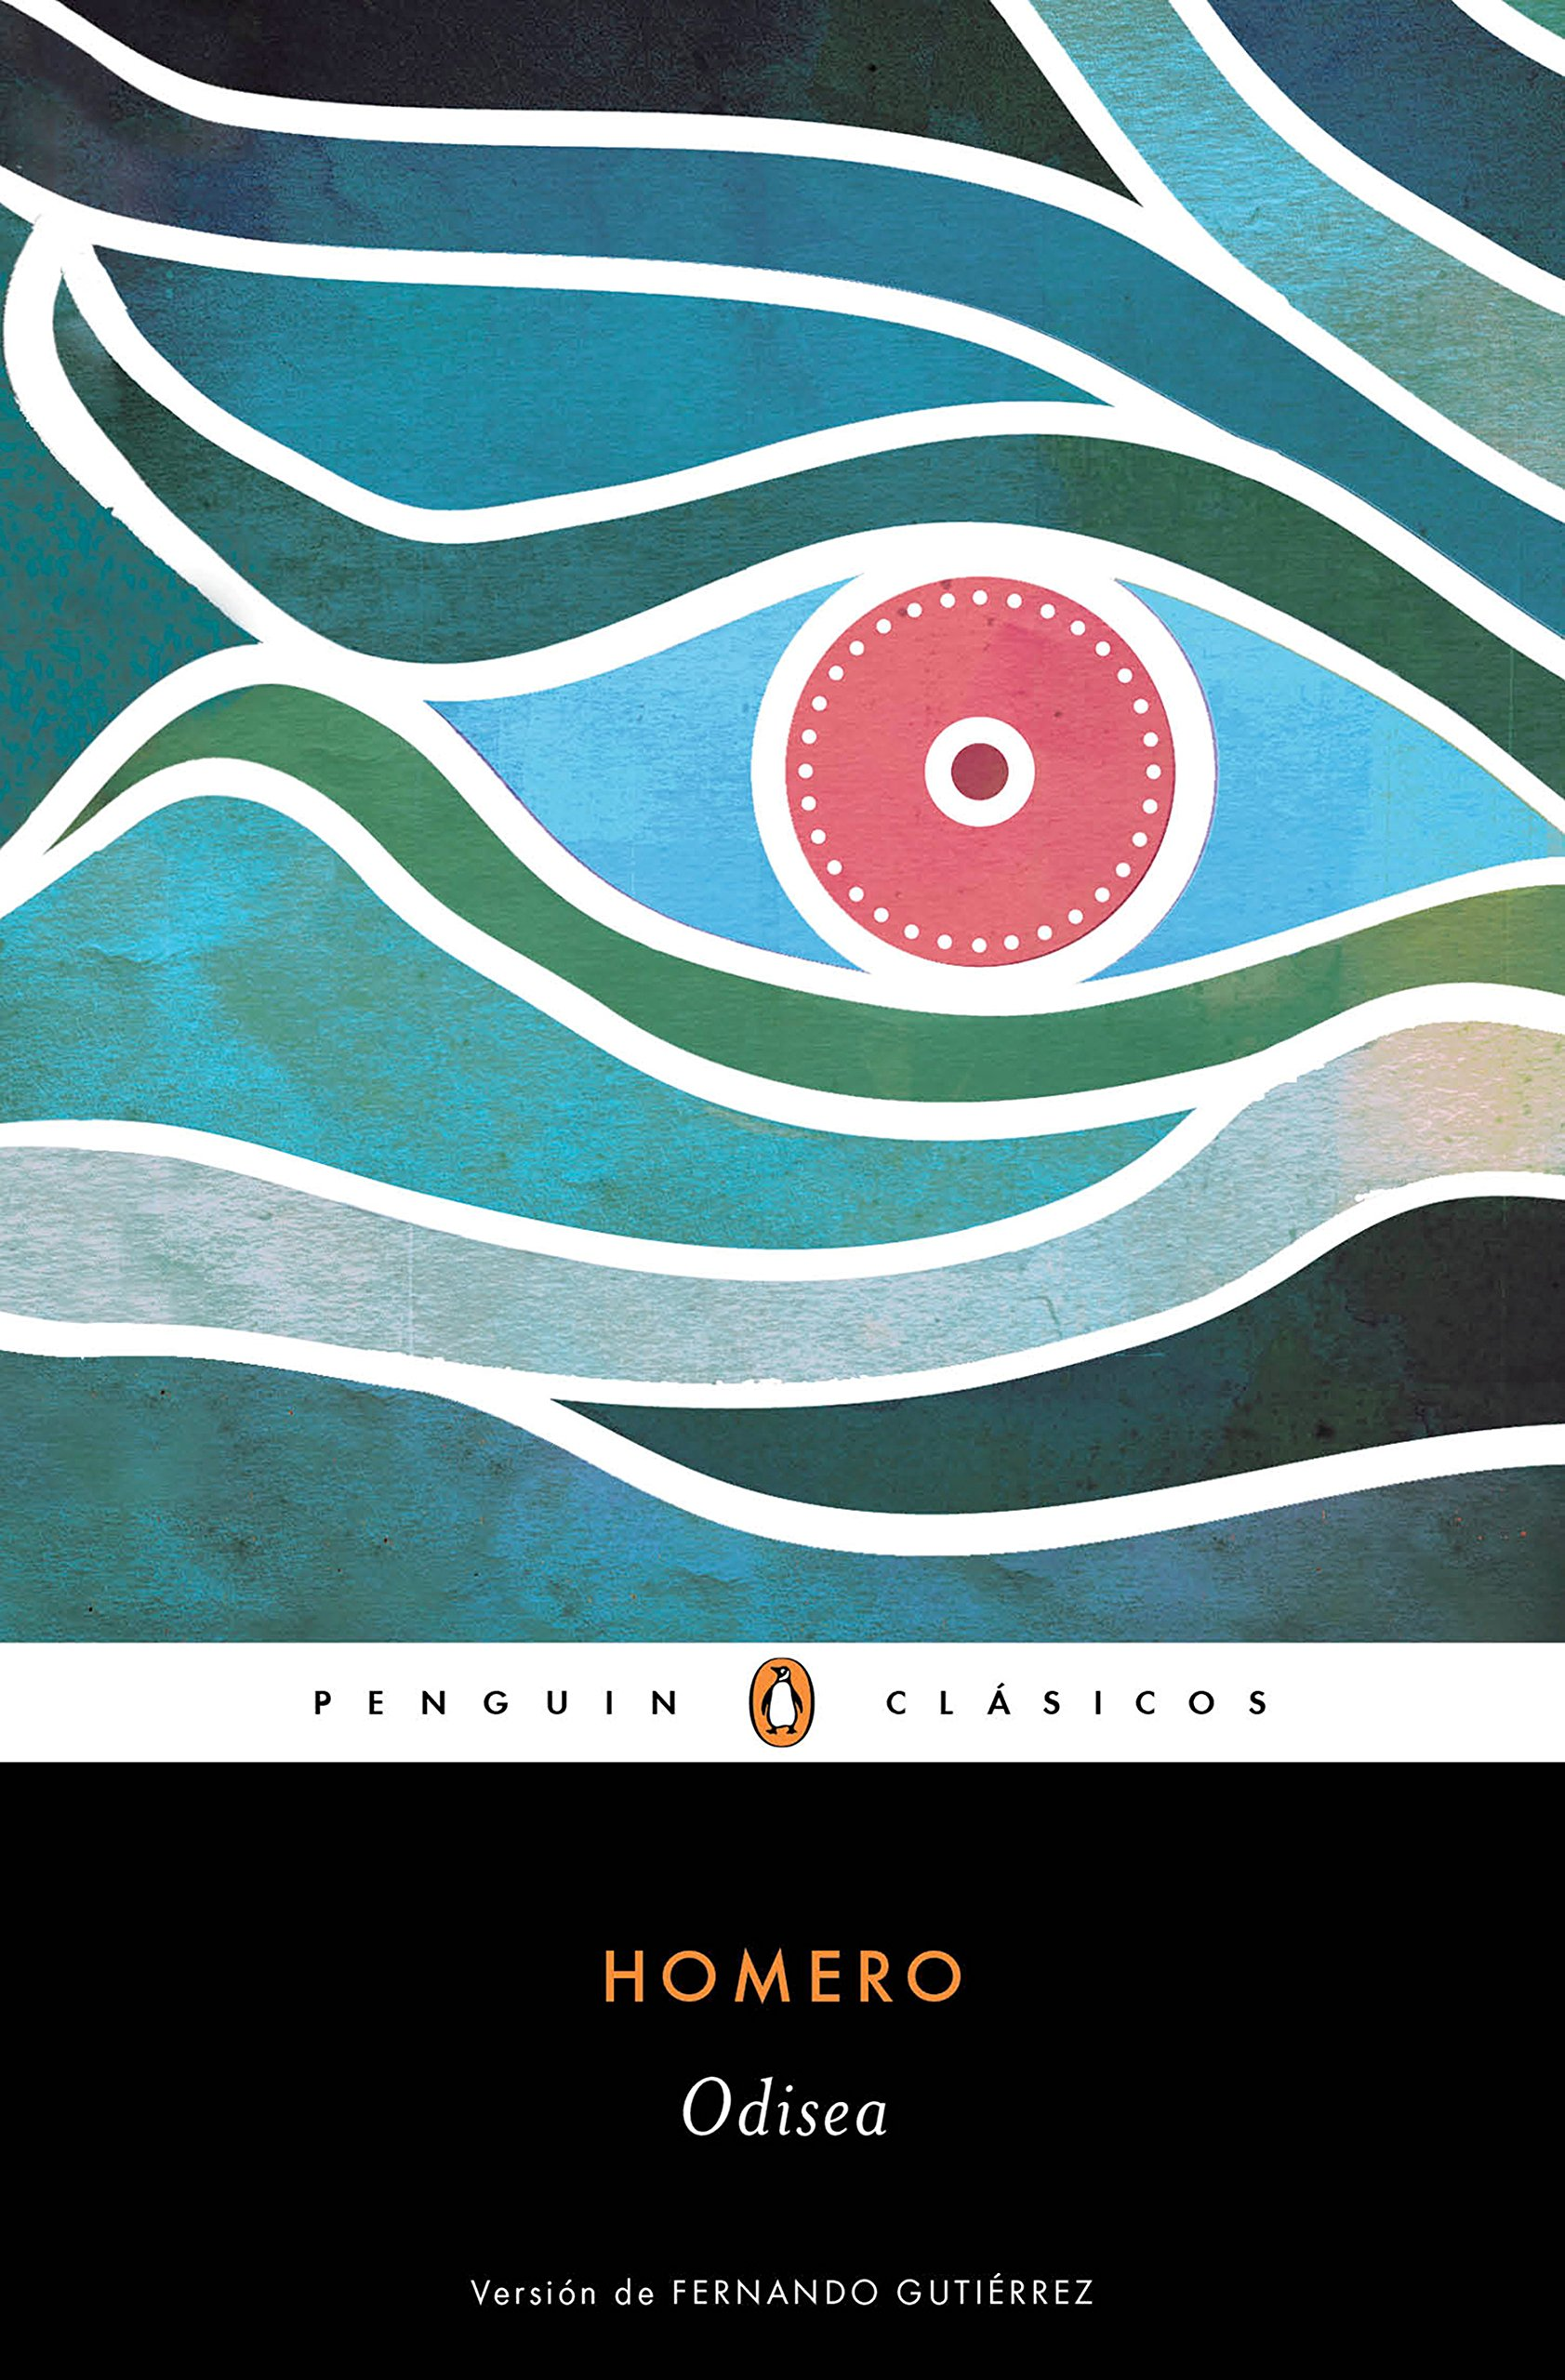 Odisea (PENGUIN CLÁSICOS) Tapa blanda – 21 jun 2018 Homero Homero PENGUIN CLASICOS 8491050809 FICTION / Classics